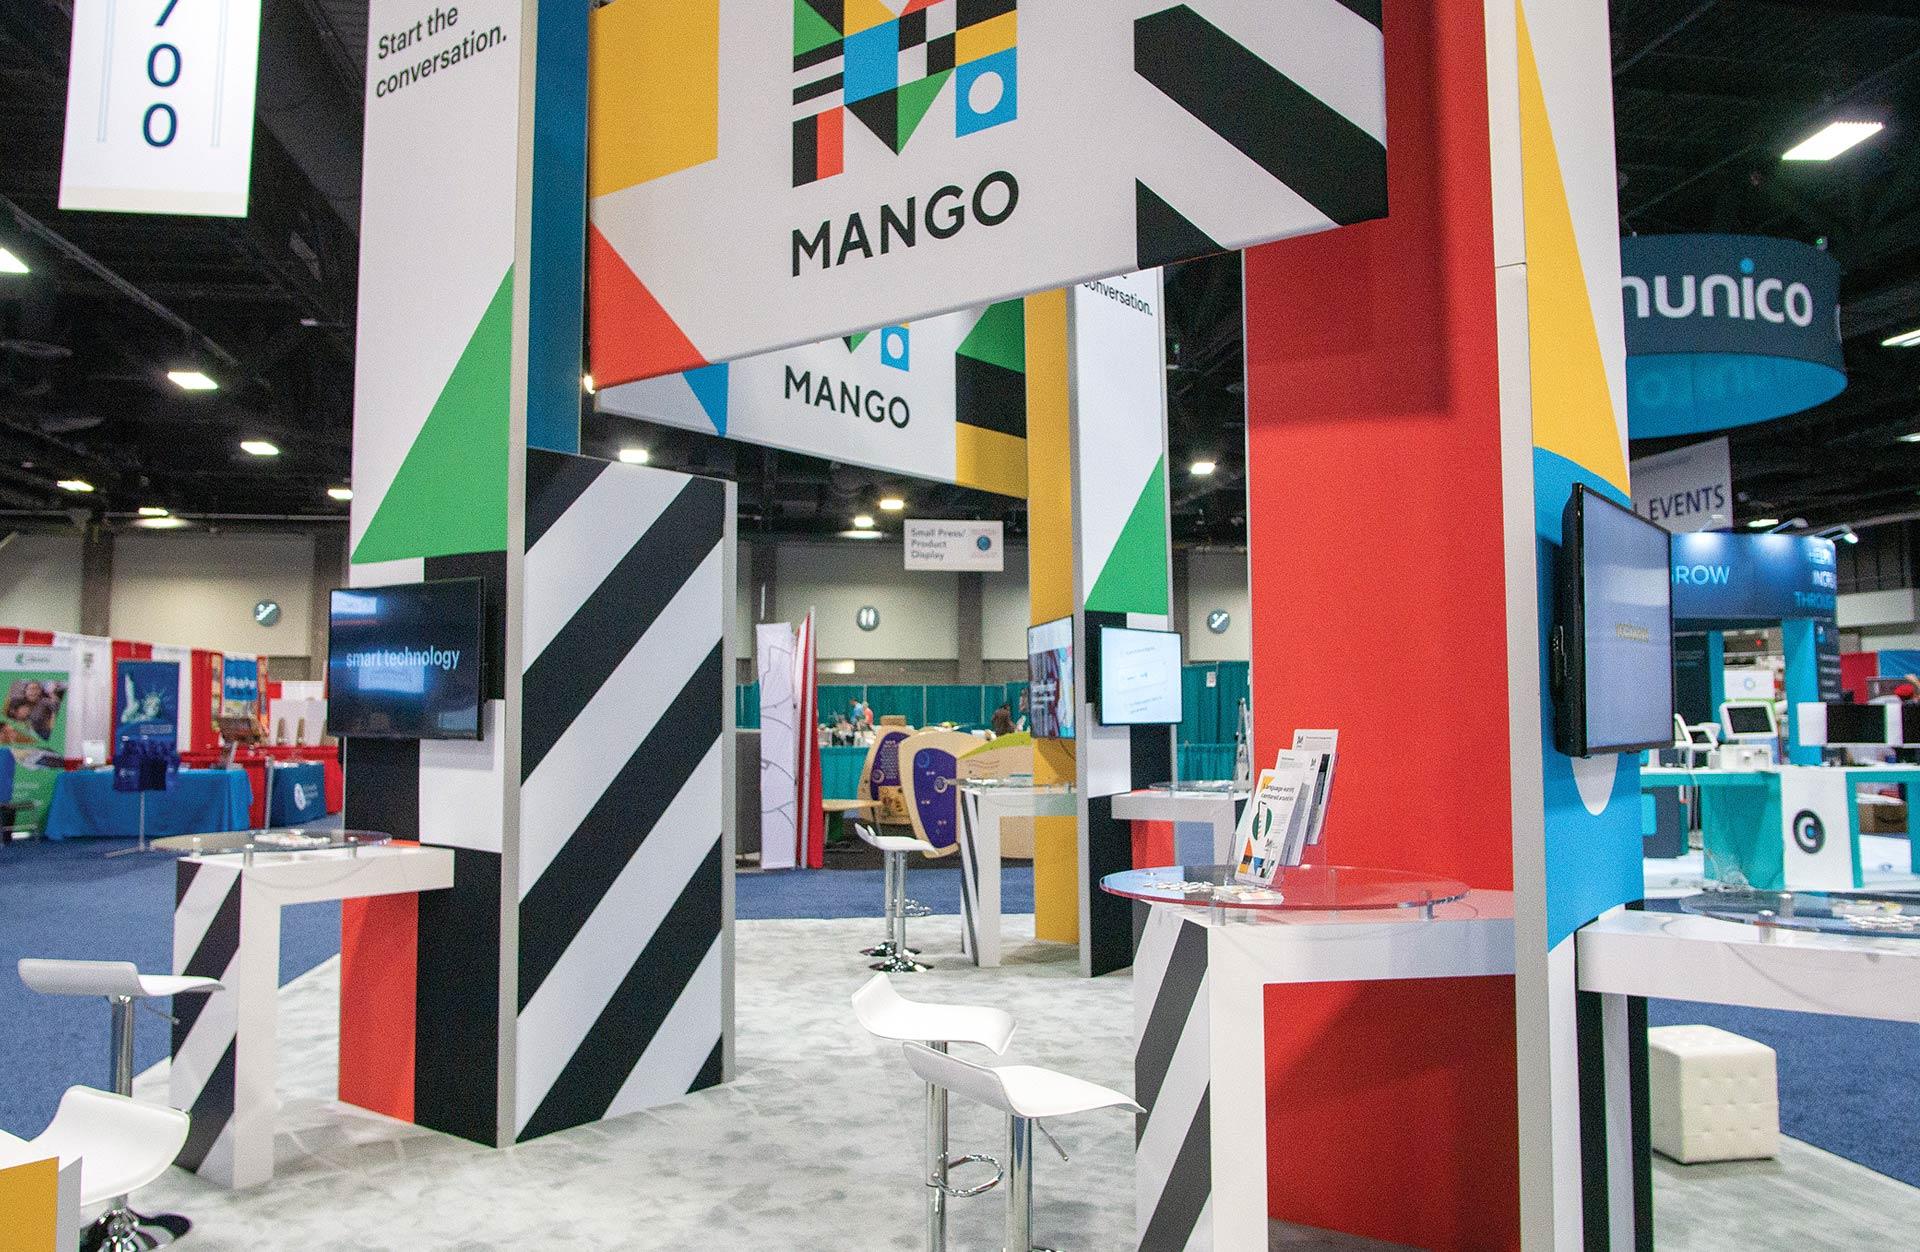 mango-booth-8.jpg